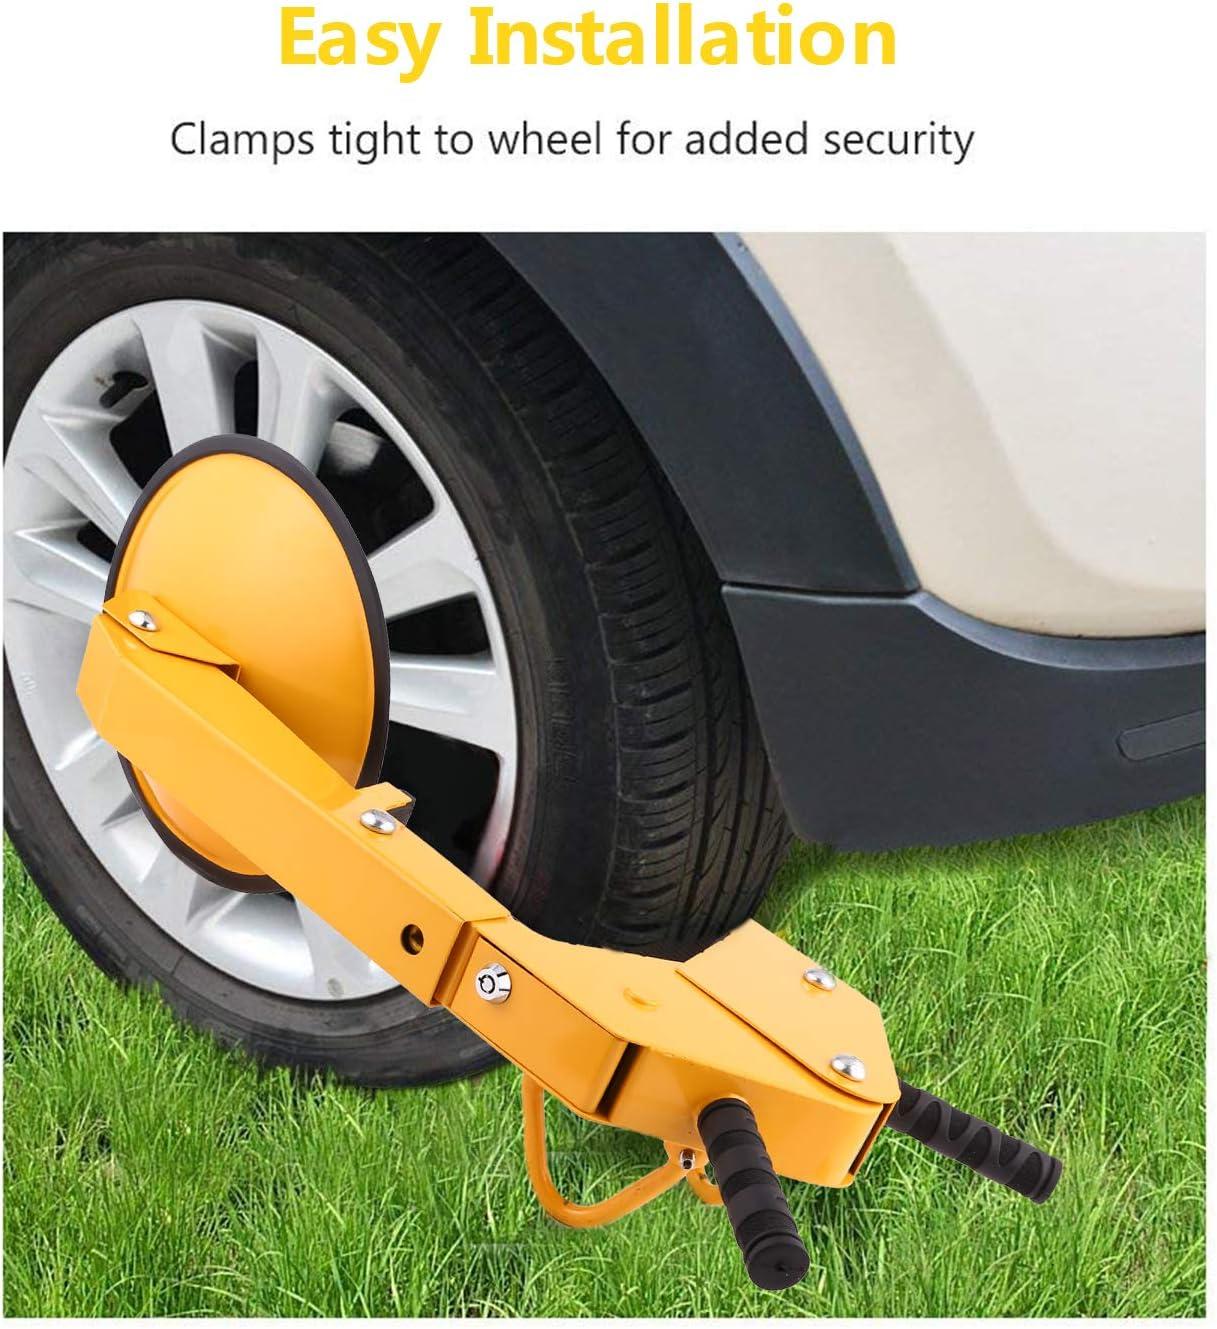 Wheel Lock Caravan And Trailer Boot Tire Trailer for Car Truck Towing 8 Hole DiscountSeller 2 x Heavy Duty Car//Van Wheel Anti-Theft Security Clamp